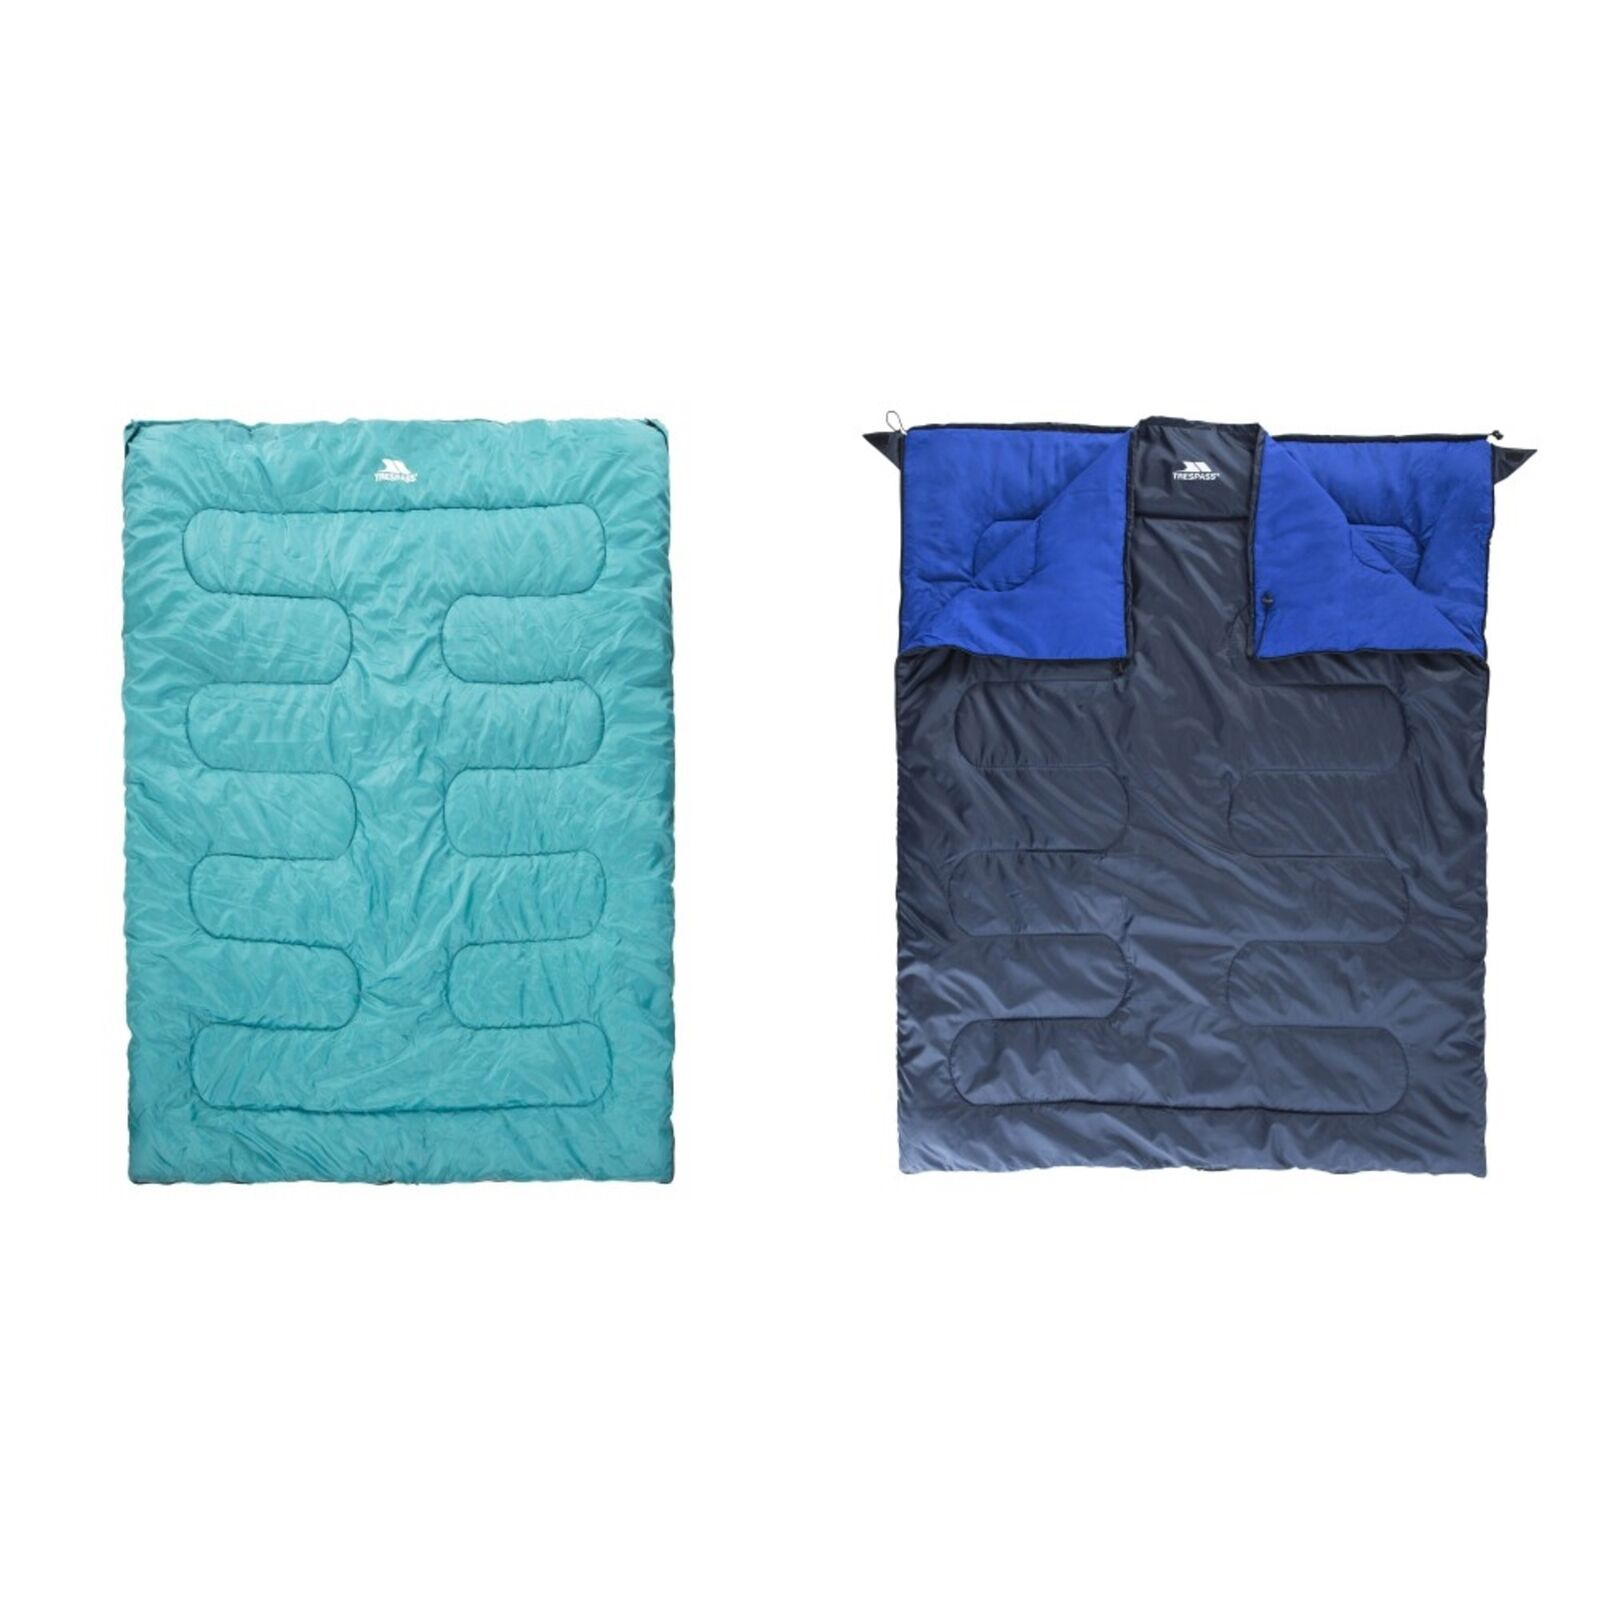 Trespass Catnap 3 Season Double Sleeping Bag